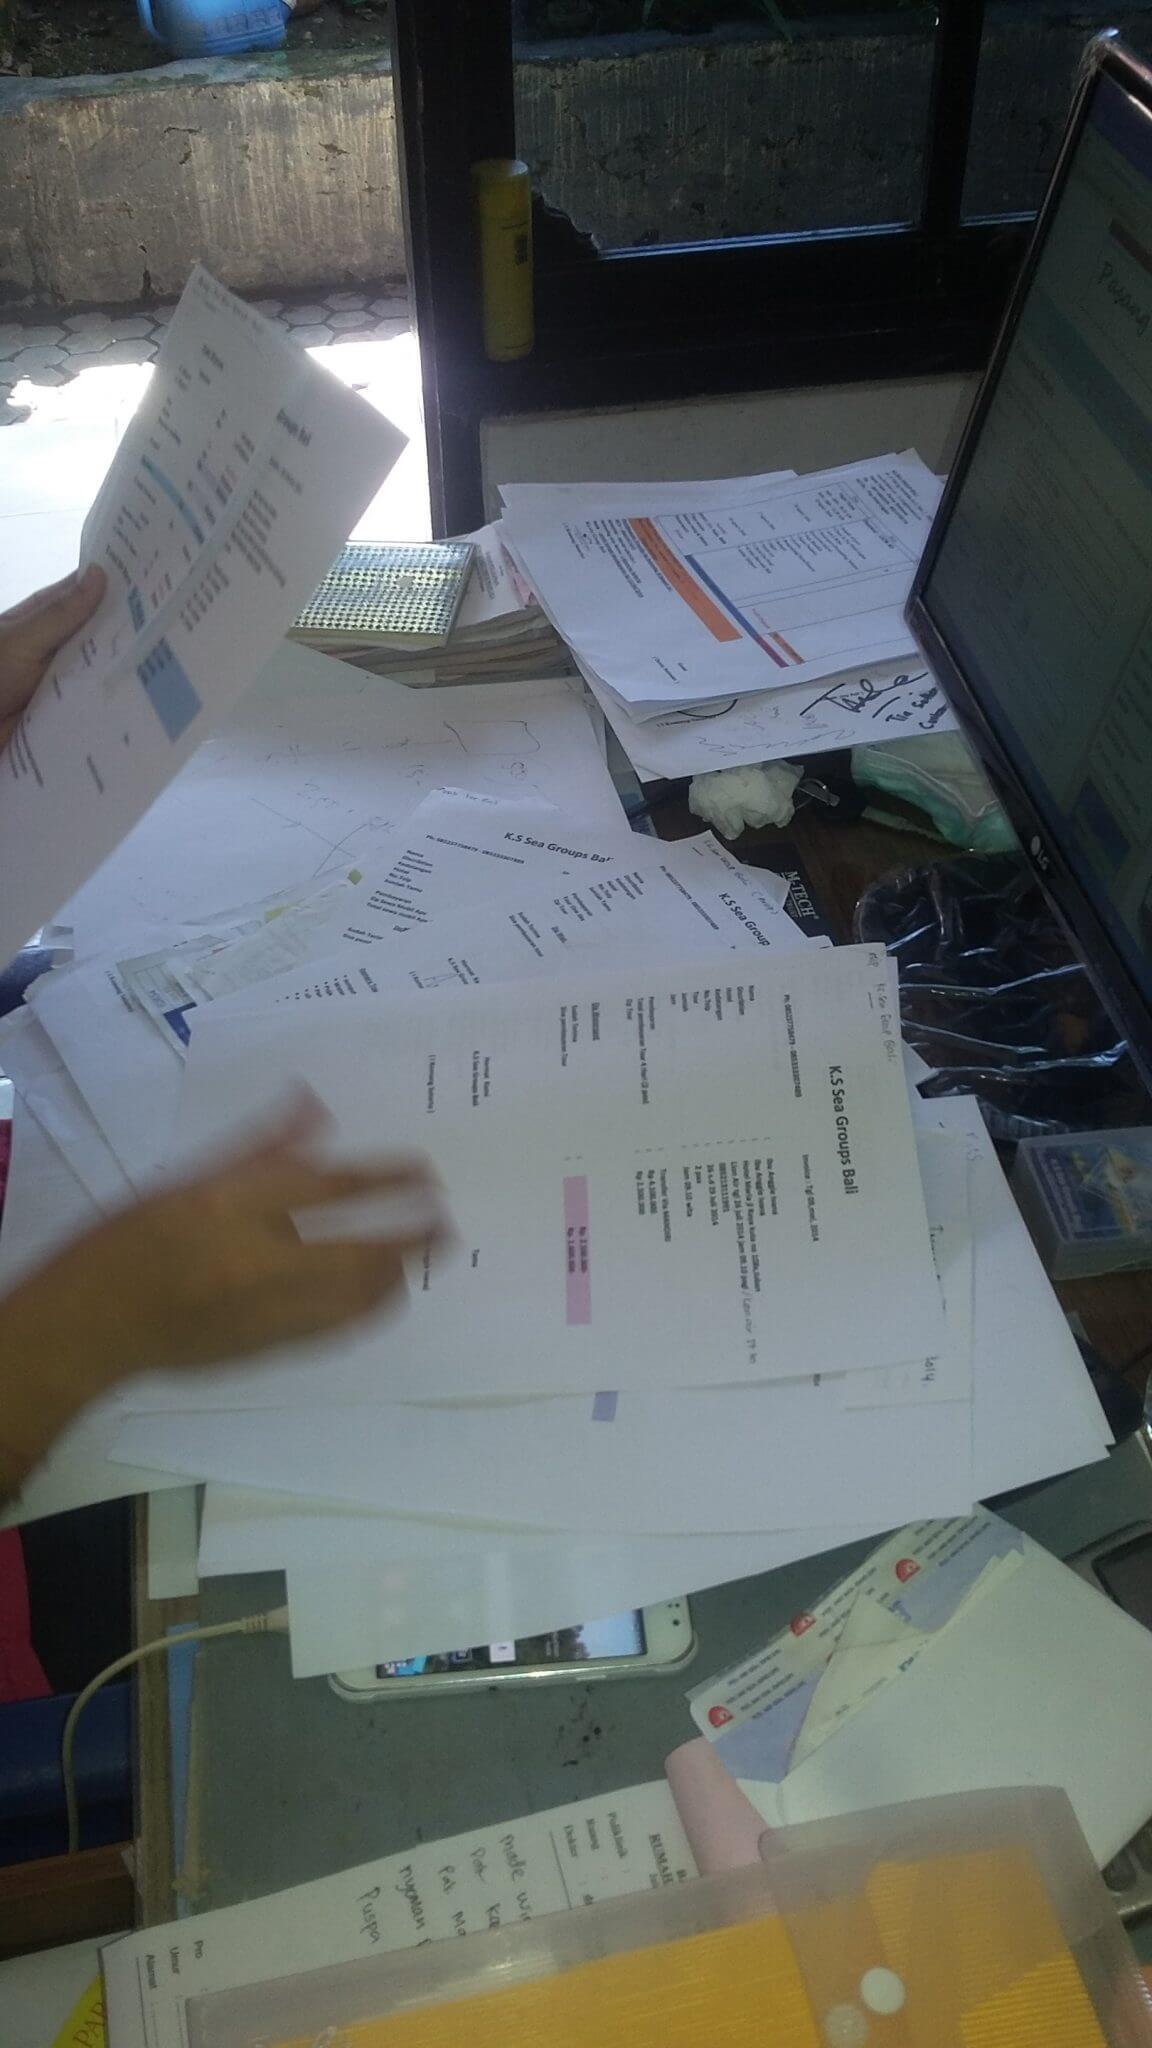 Kss Bali tour invoice terorganise